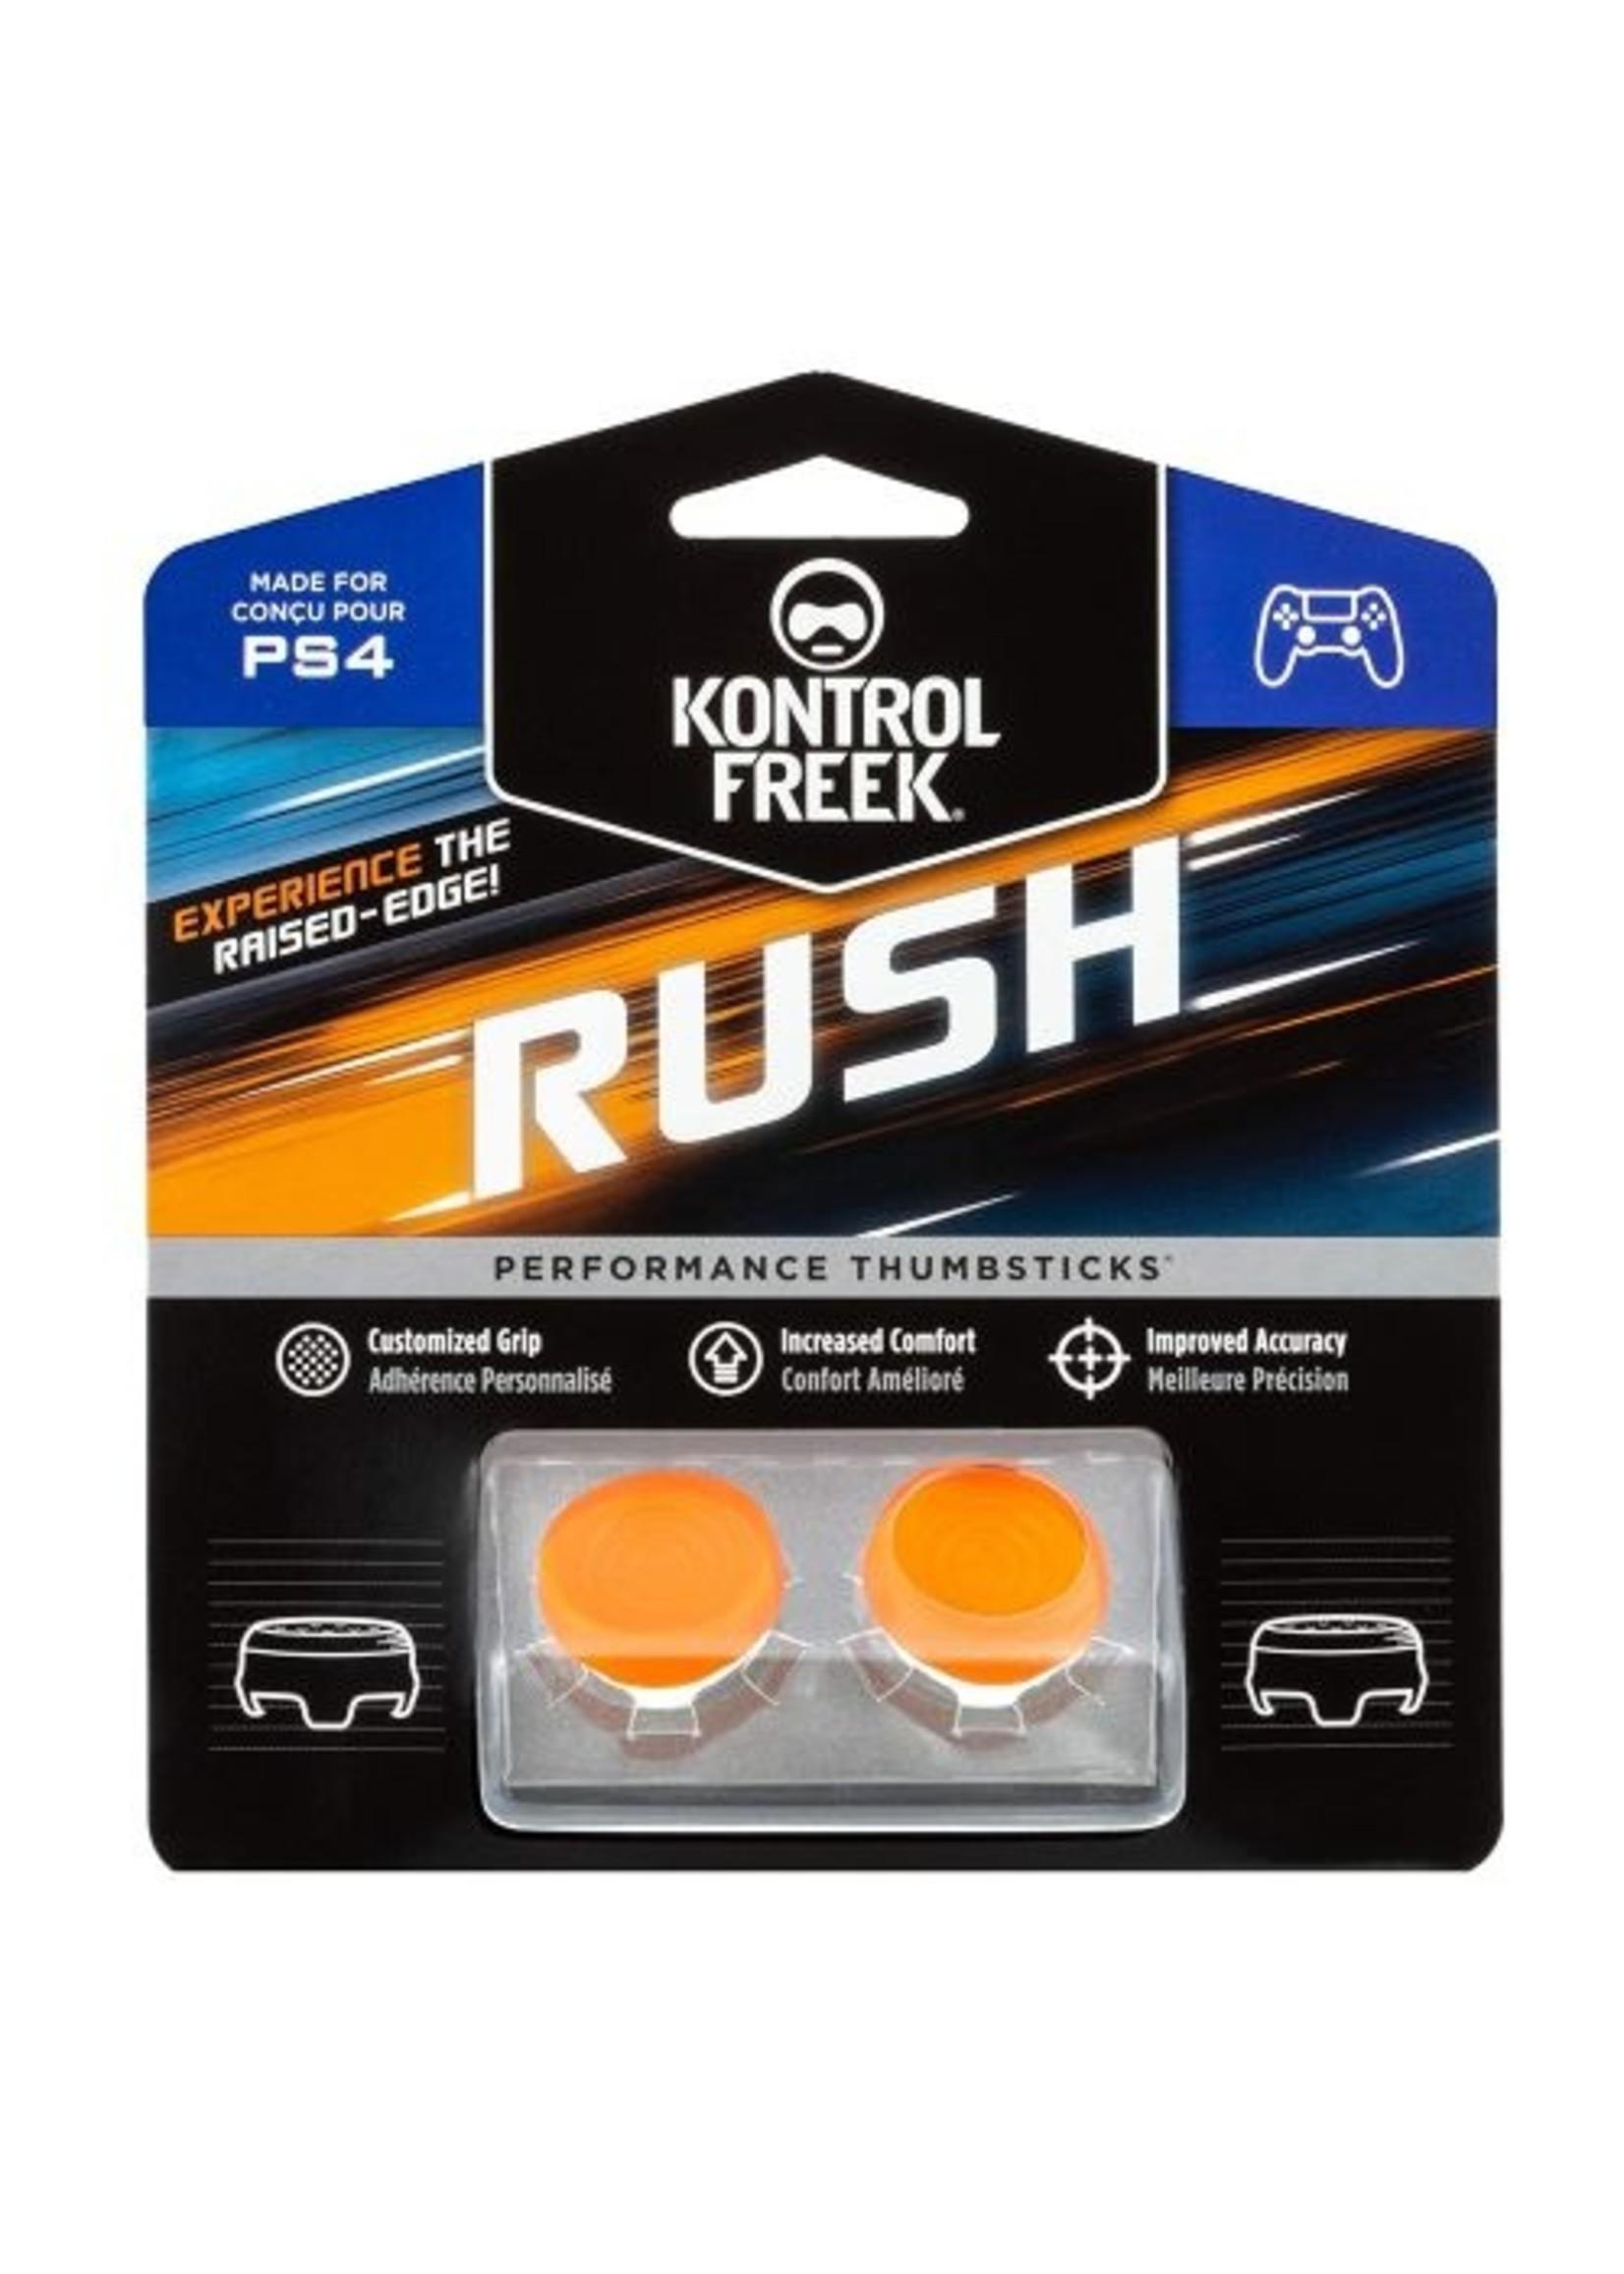 KontrolFreek PS4 FPS Freek Rush 2 Mid Rise Thumb Grip Analog Cover